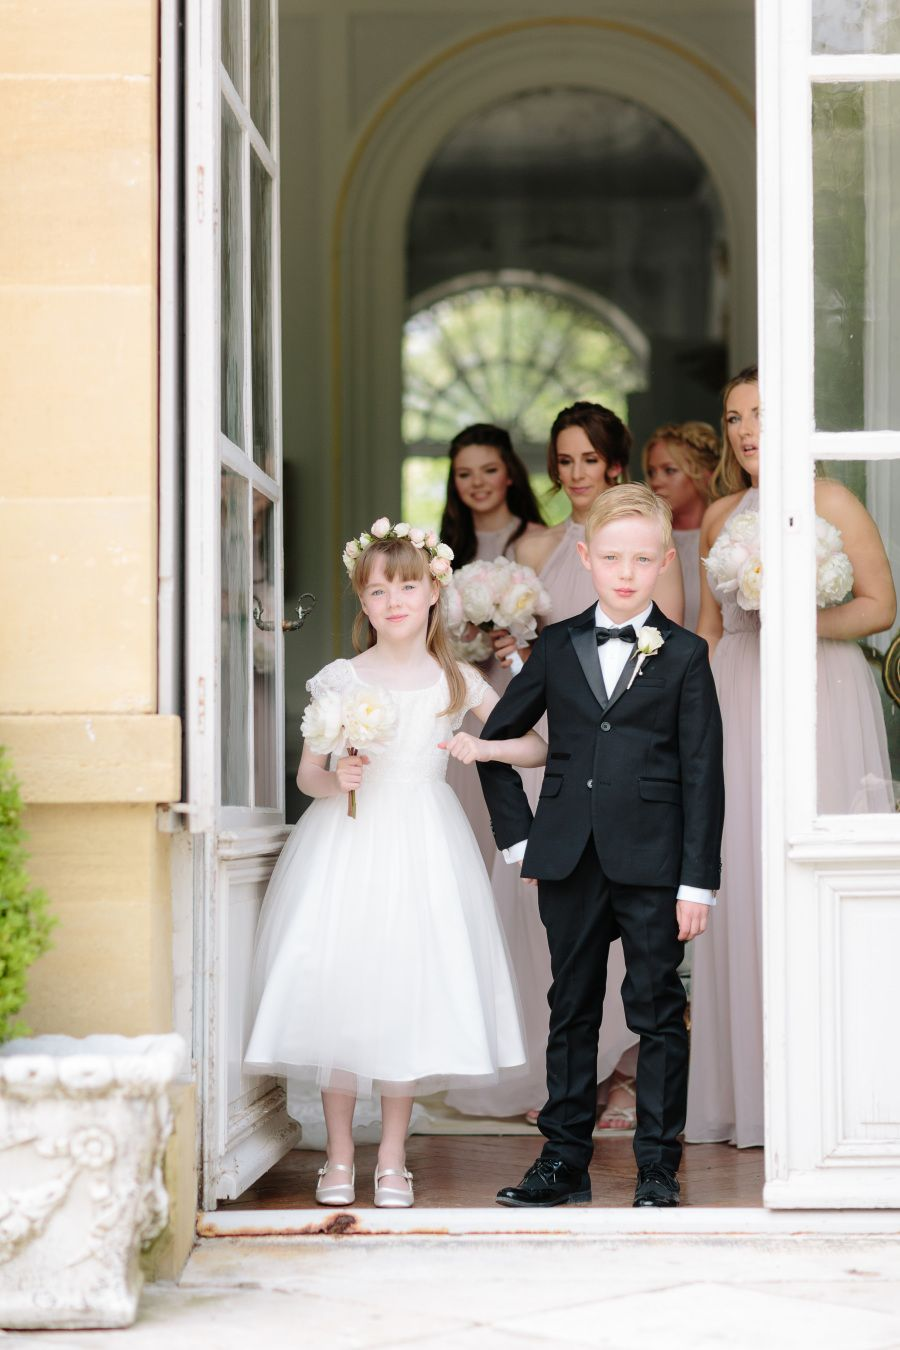 Groom's Attire: Christian Louboutin - http://us.christianlouboutin.com/us_en/ Wedding Dress: Inbal Dror - http://www.stylemepretty.com/portfolio/inbal-dror-3 Photography: French Grey Photography - frenchgreyphotography.com   Read More on SMP: http://www.stylemepretty.com/destination-weddings/france-weddings/2016/08/29/glamorous-spring-wedding-at-french-chateau/